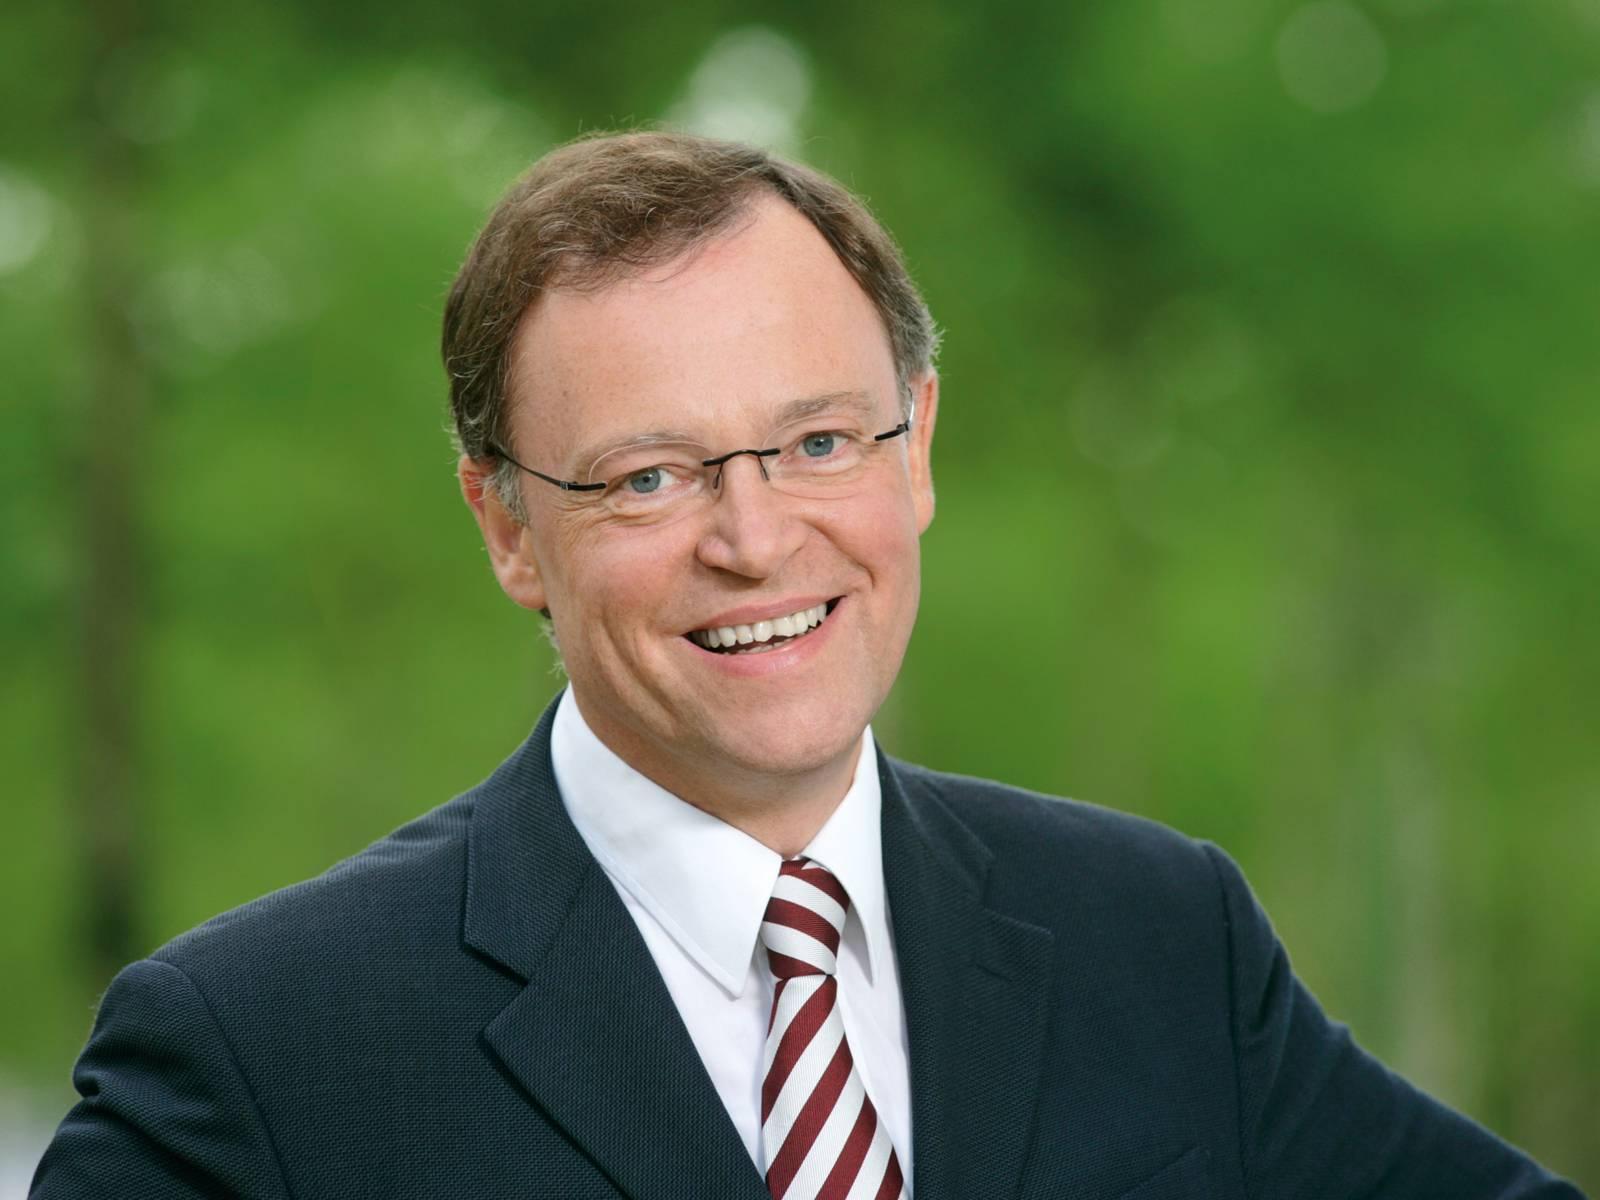 Oberbürgermeister Stephan Weil